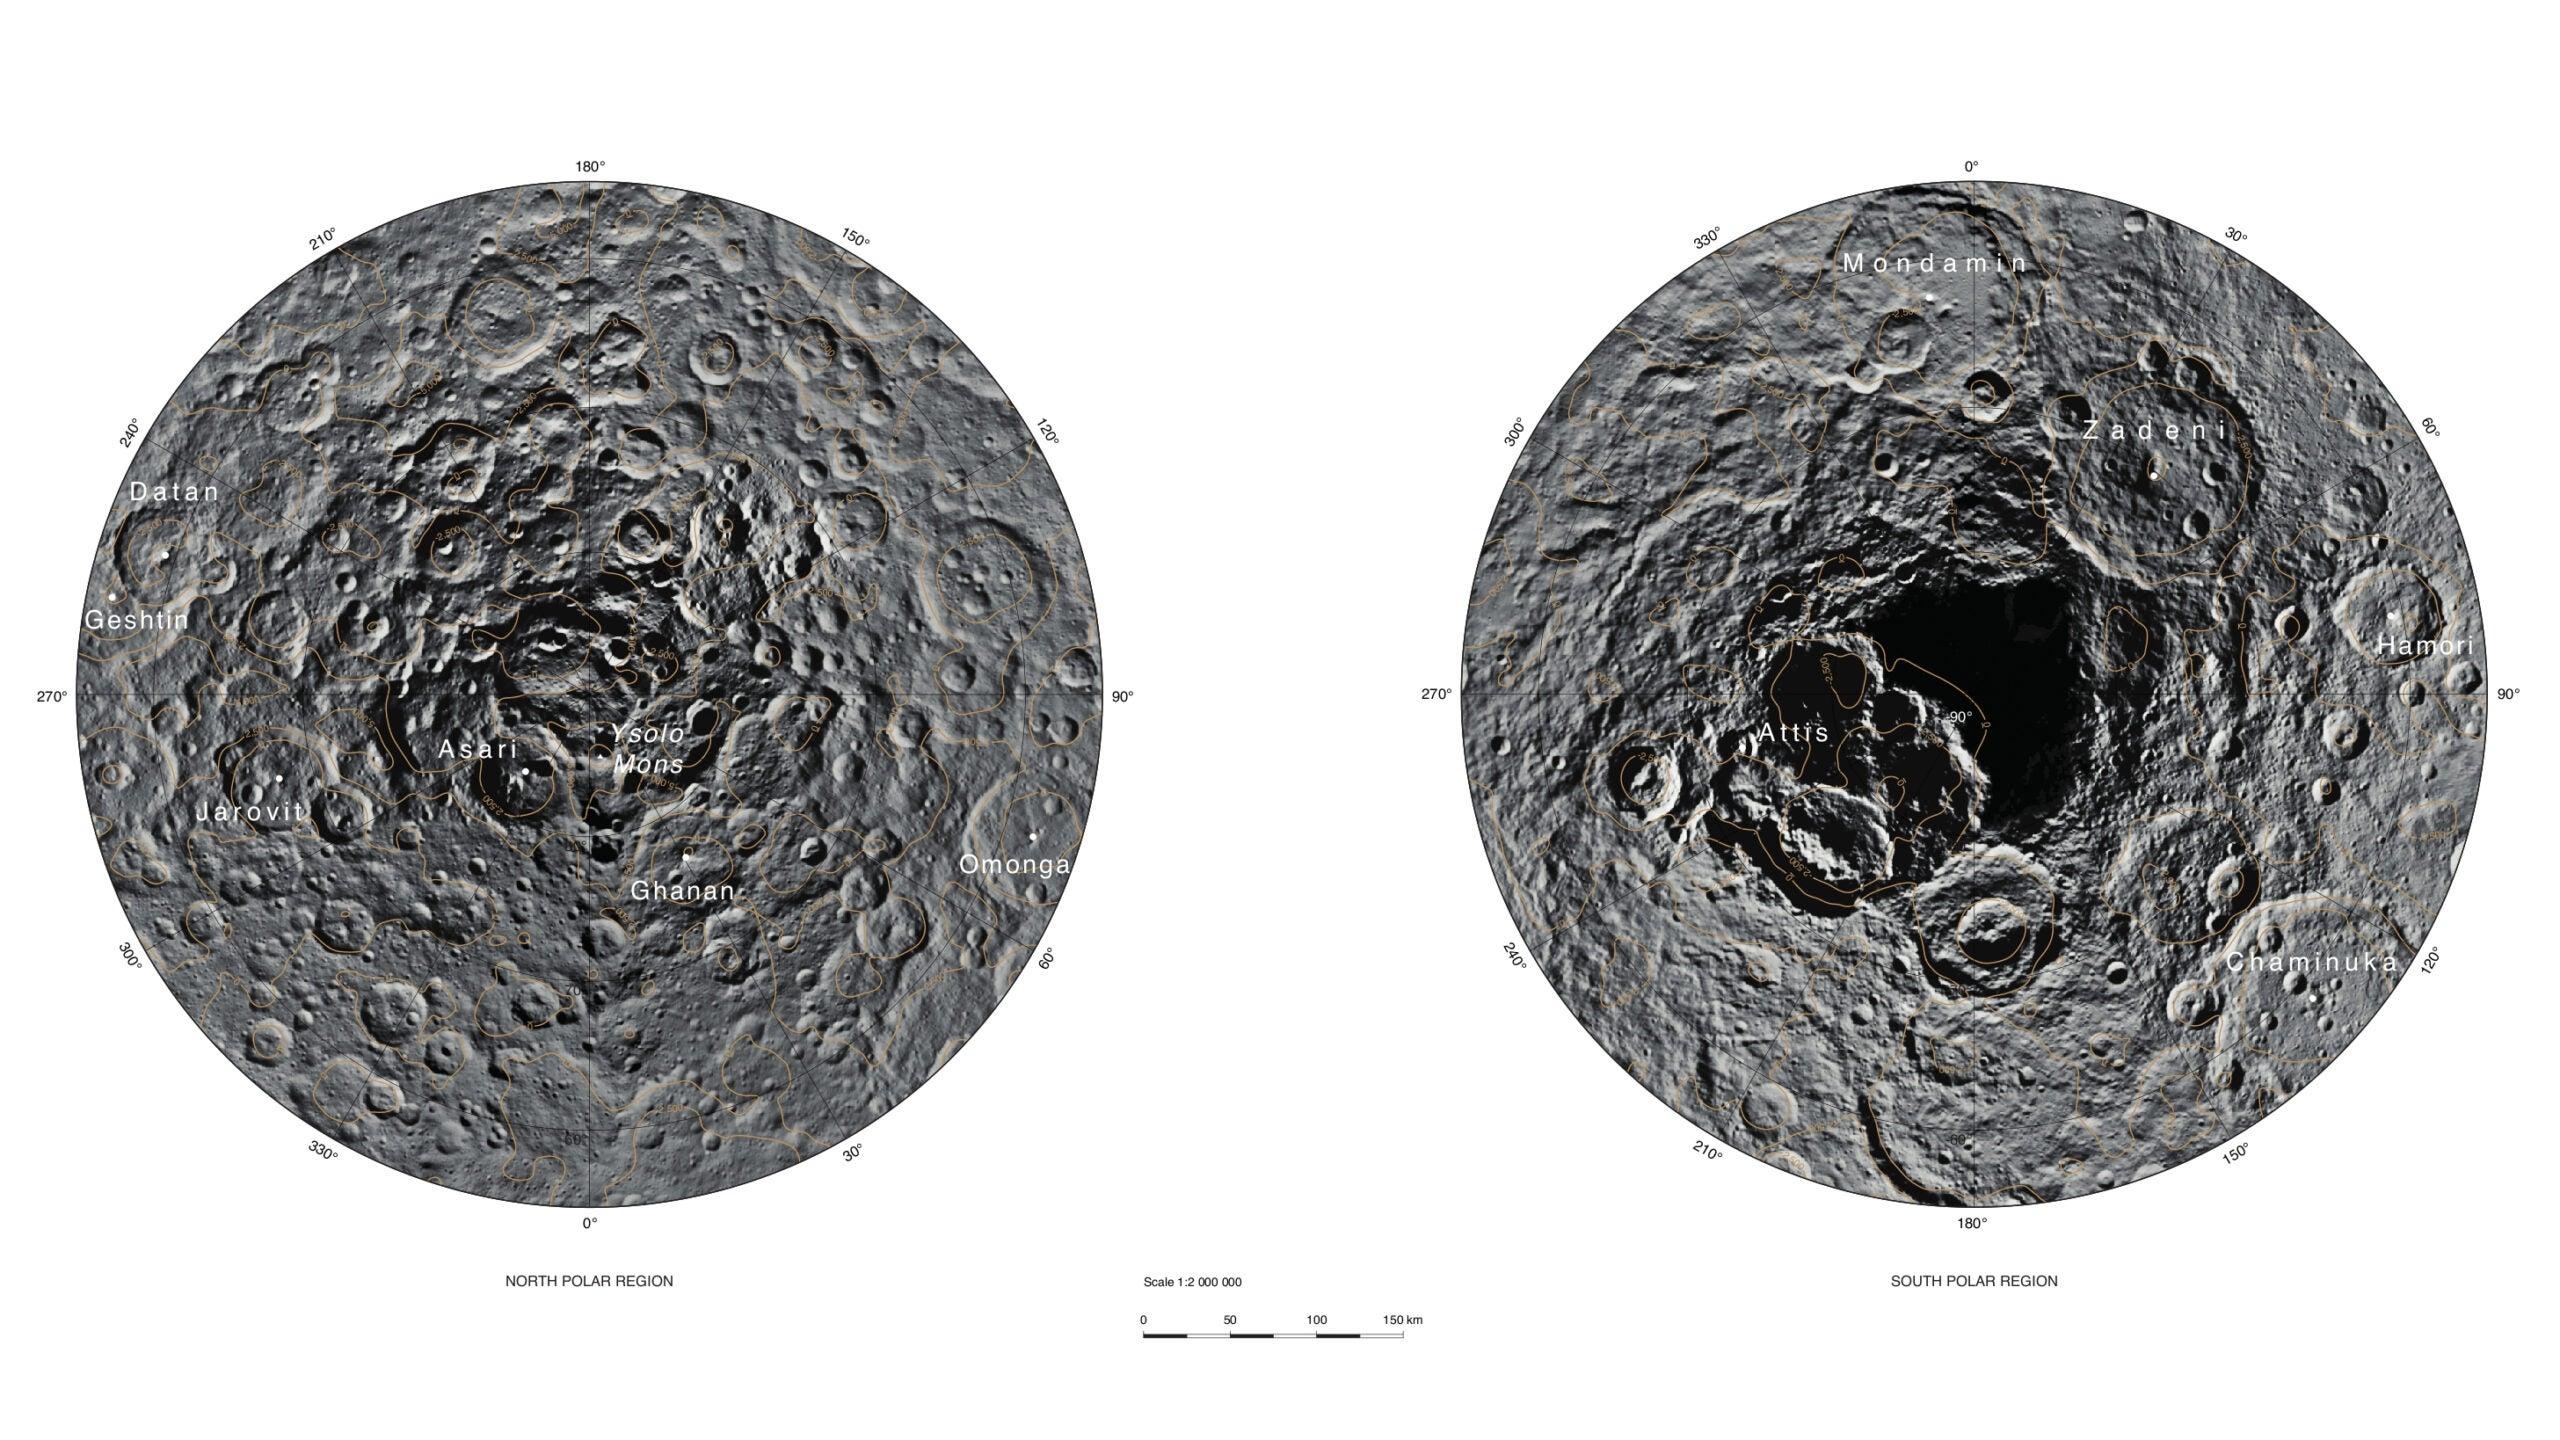 Polar Regions Of Dwarf Planet Ceres